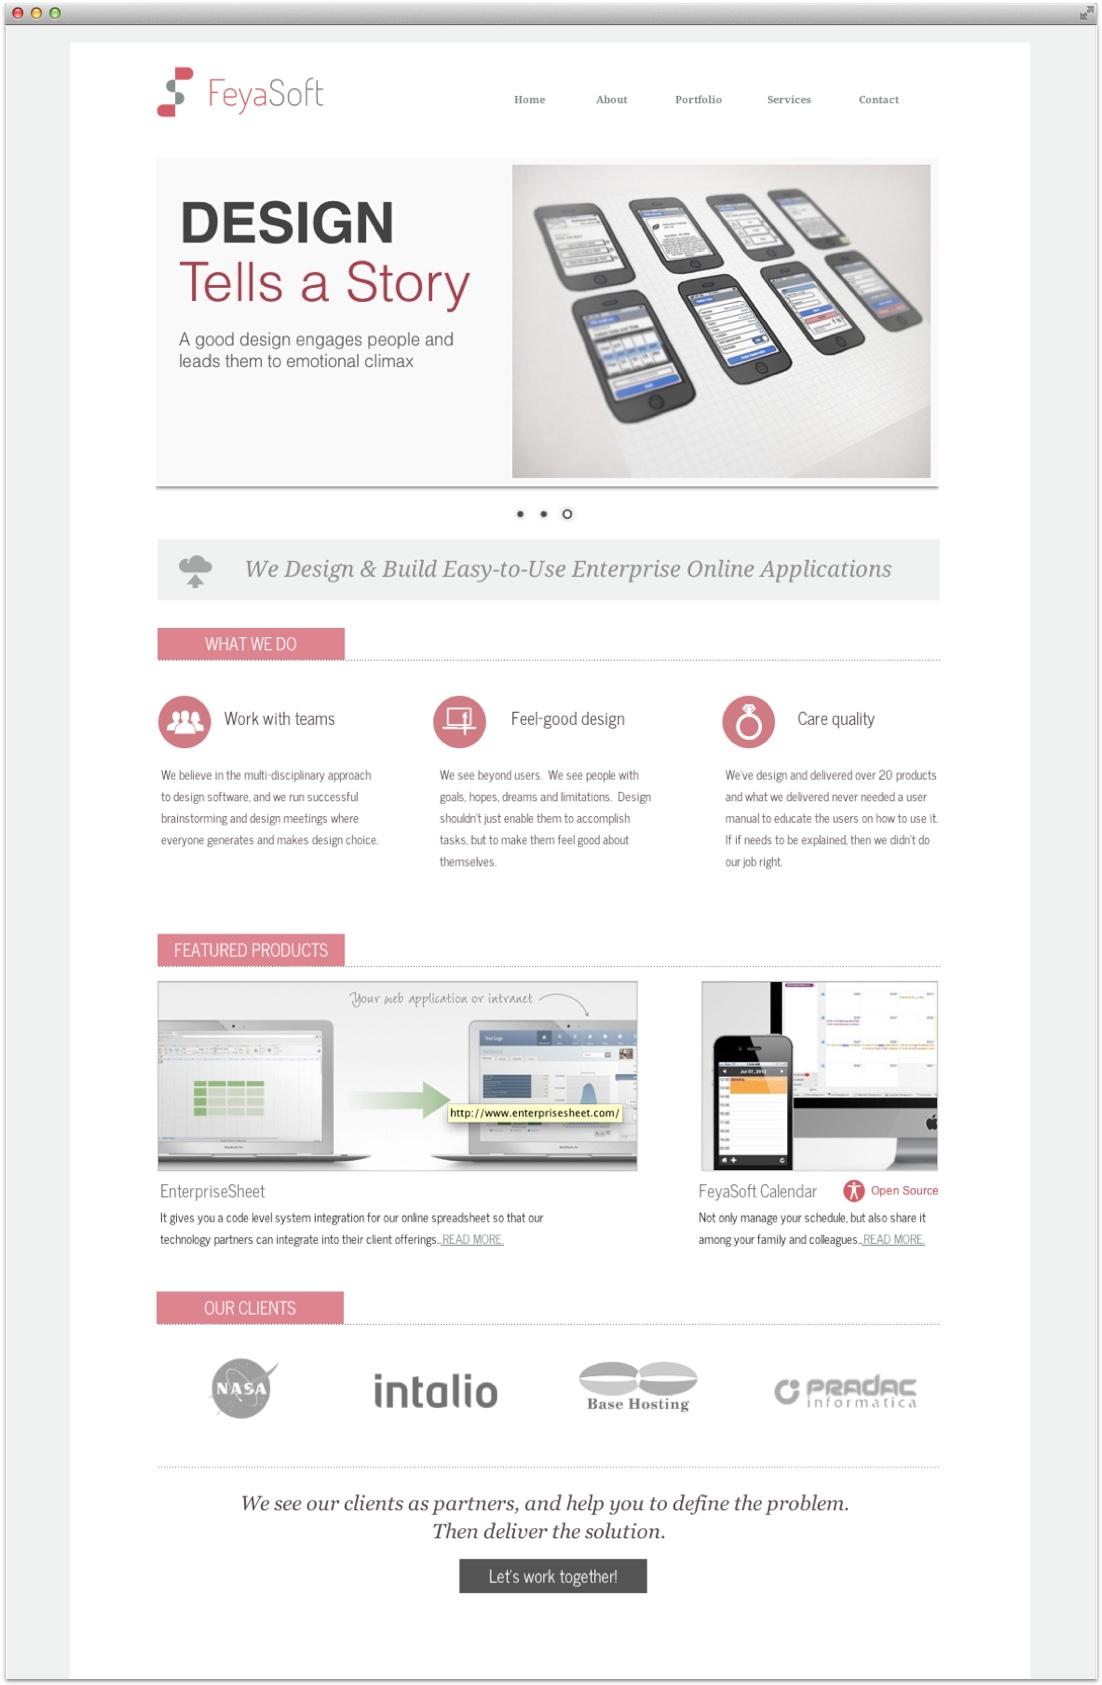 feyasoft-home-page